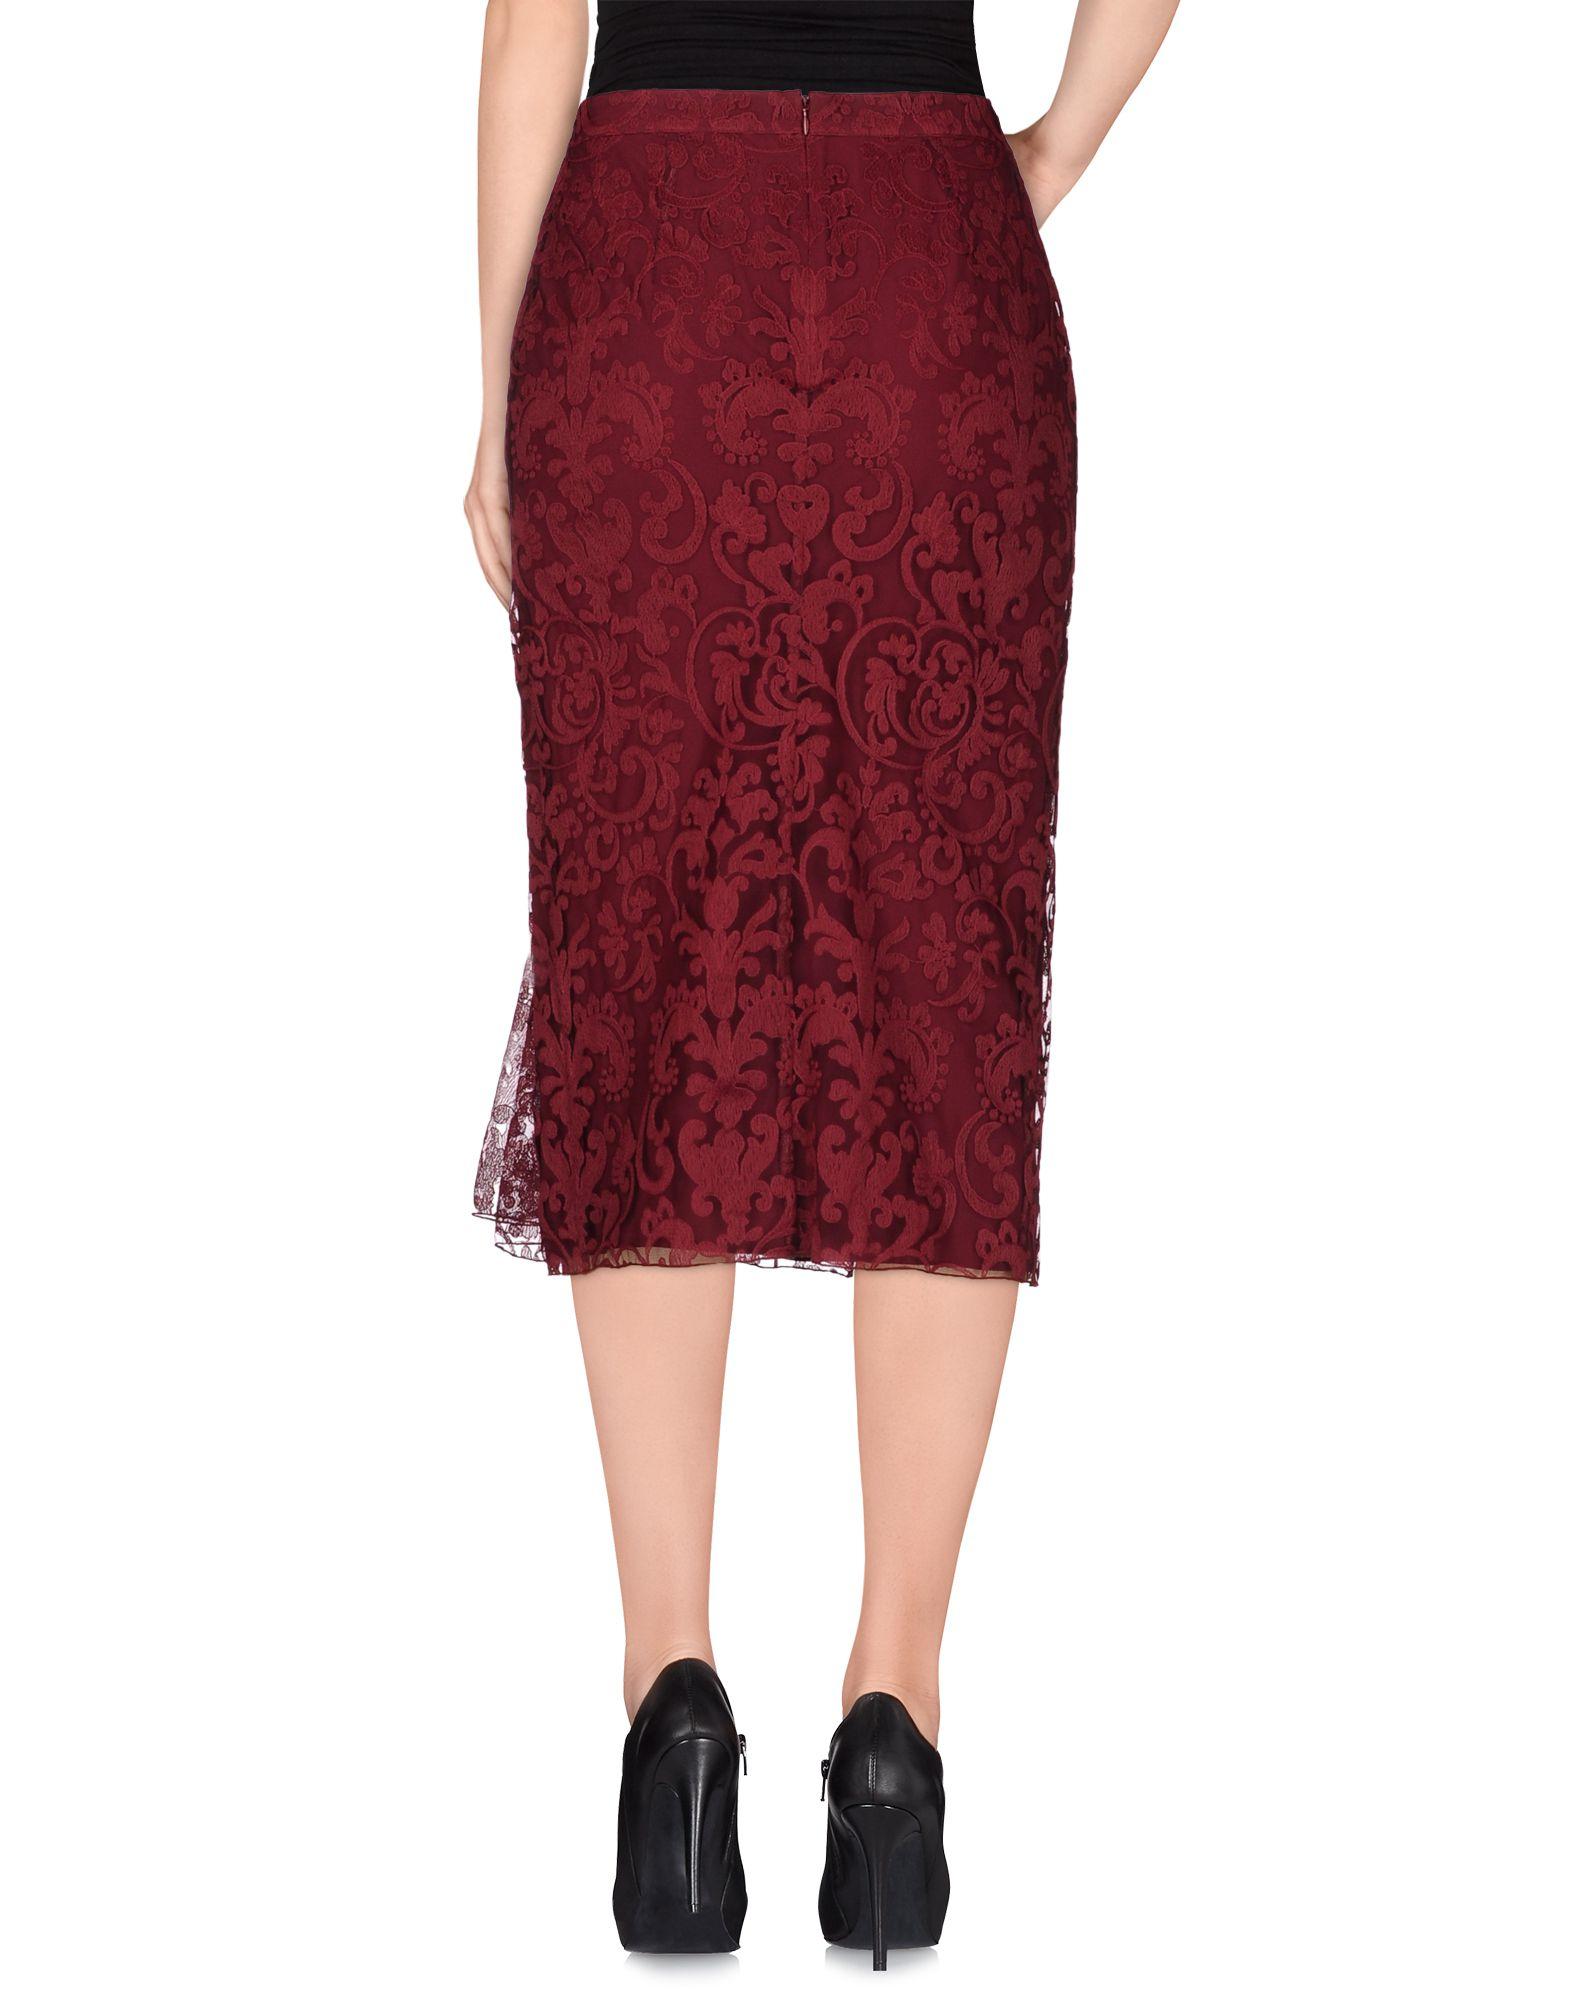 burberry prorsum 3 4 length skirt in garnet save